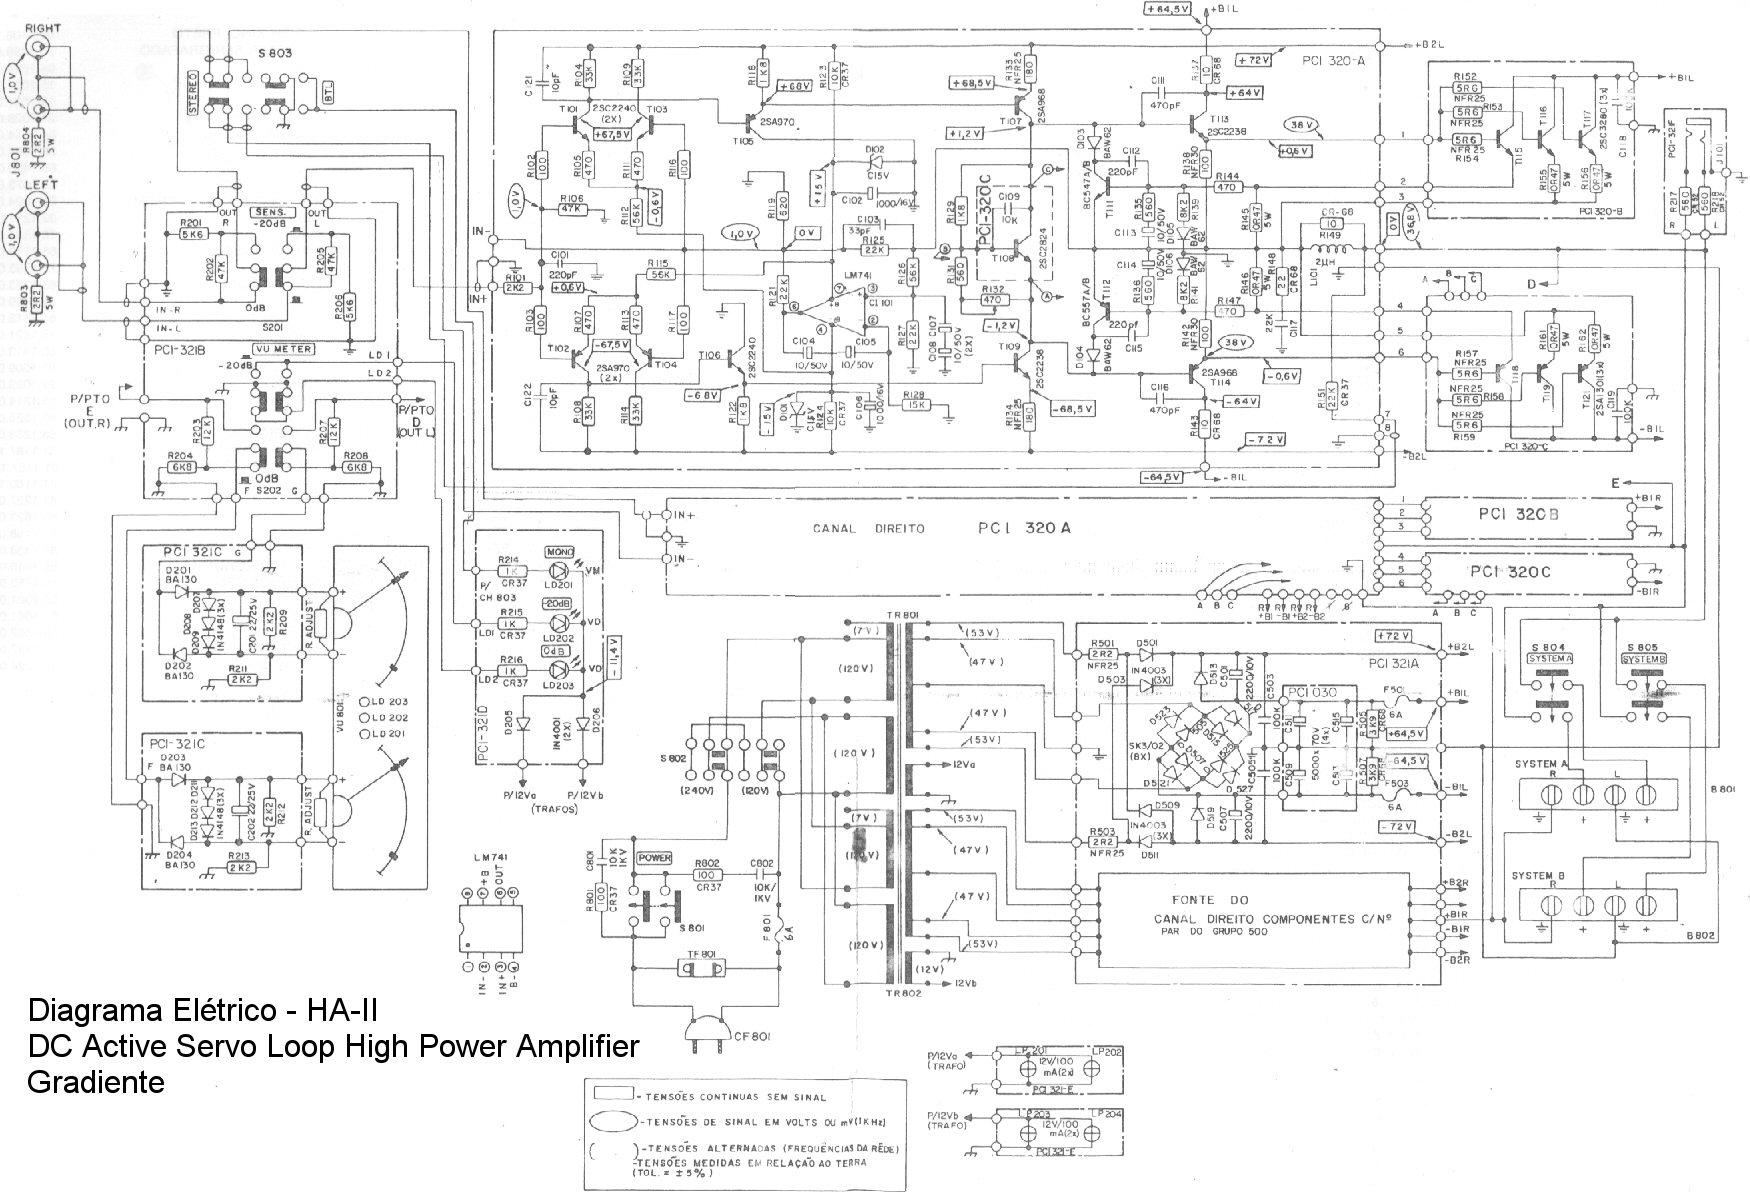 Service manual : Gradiente HA-II ha2.jpg, DC Active Servo